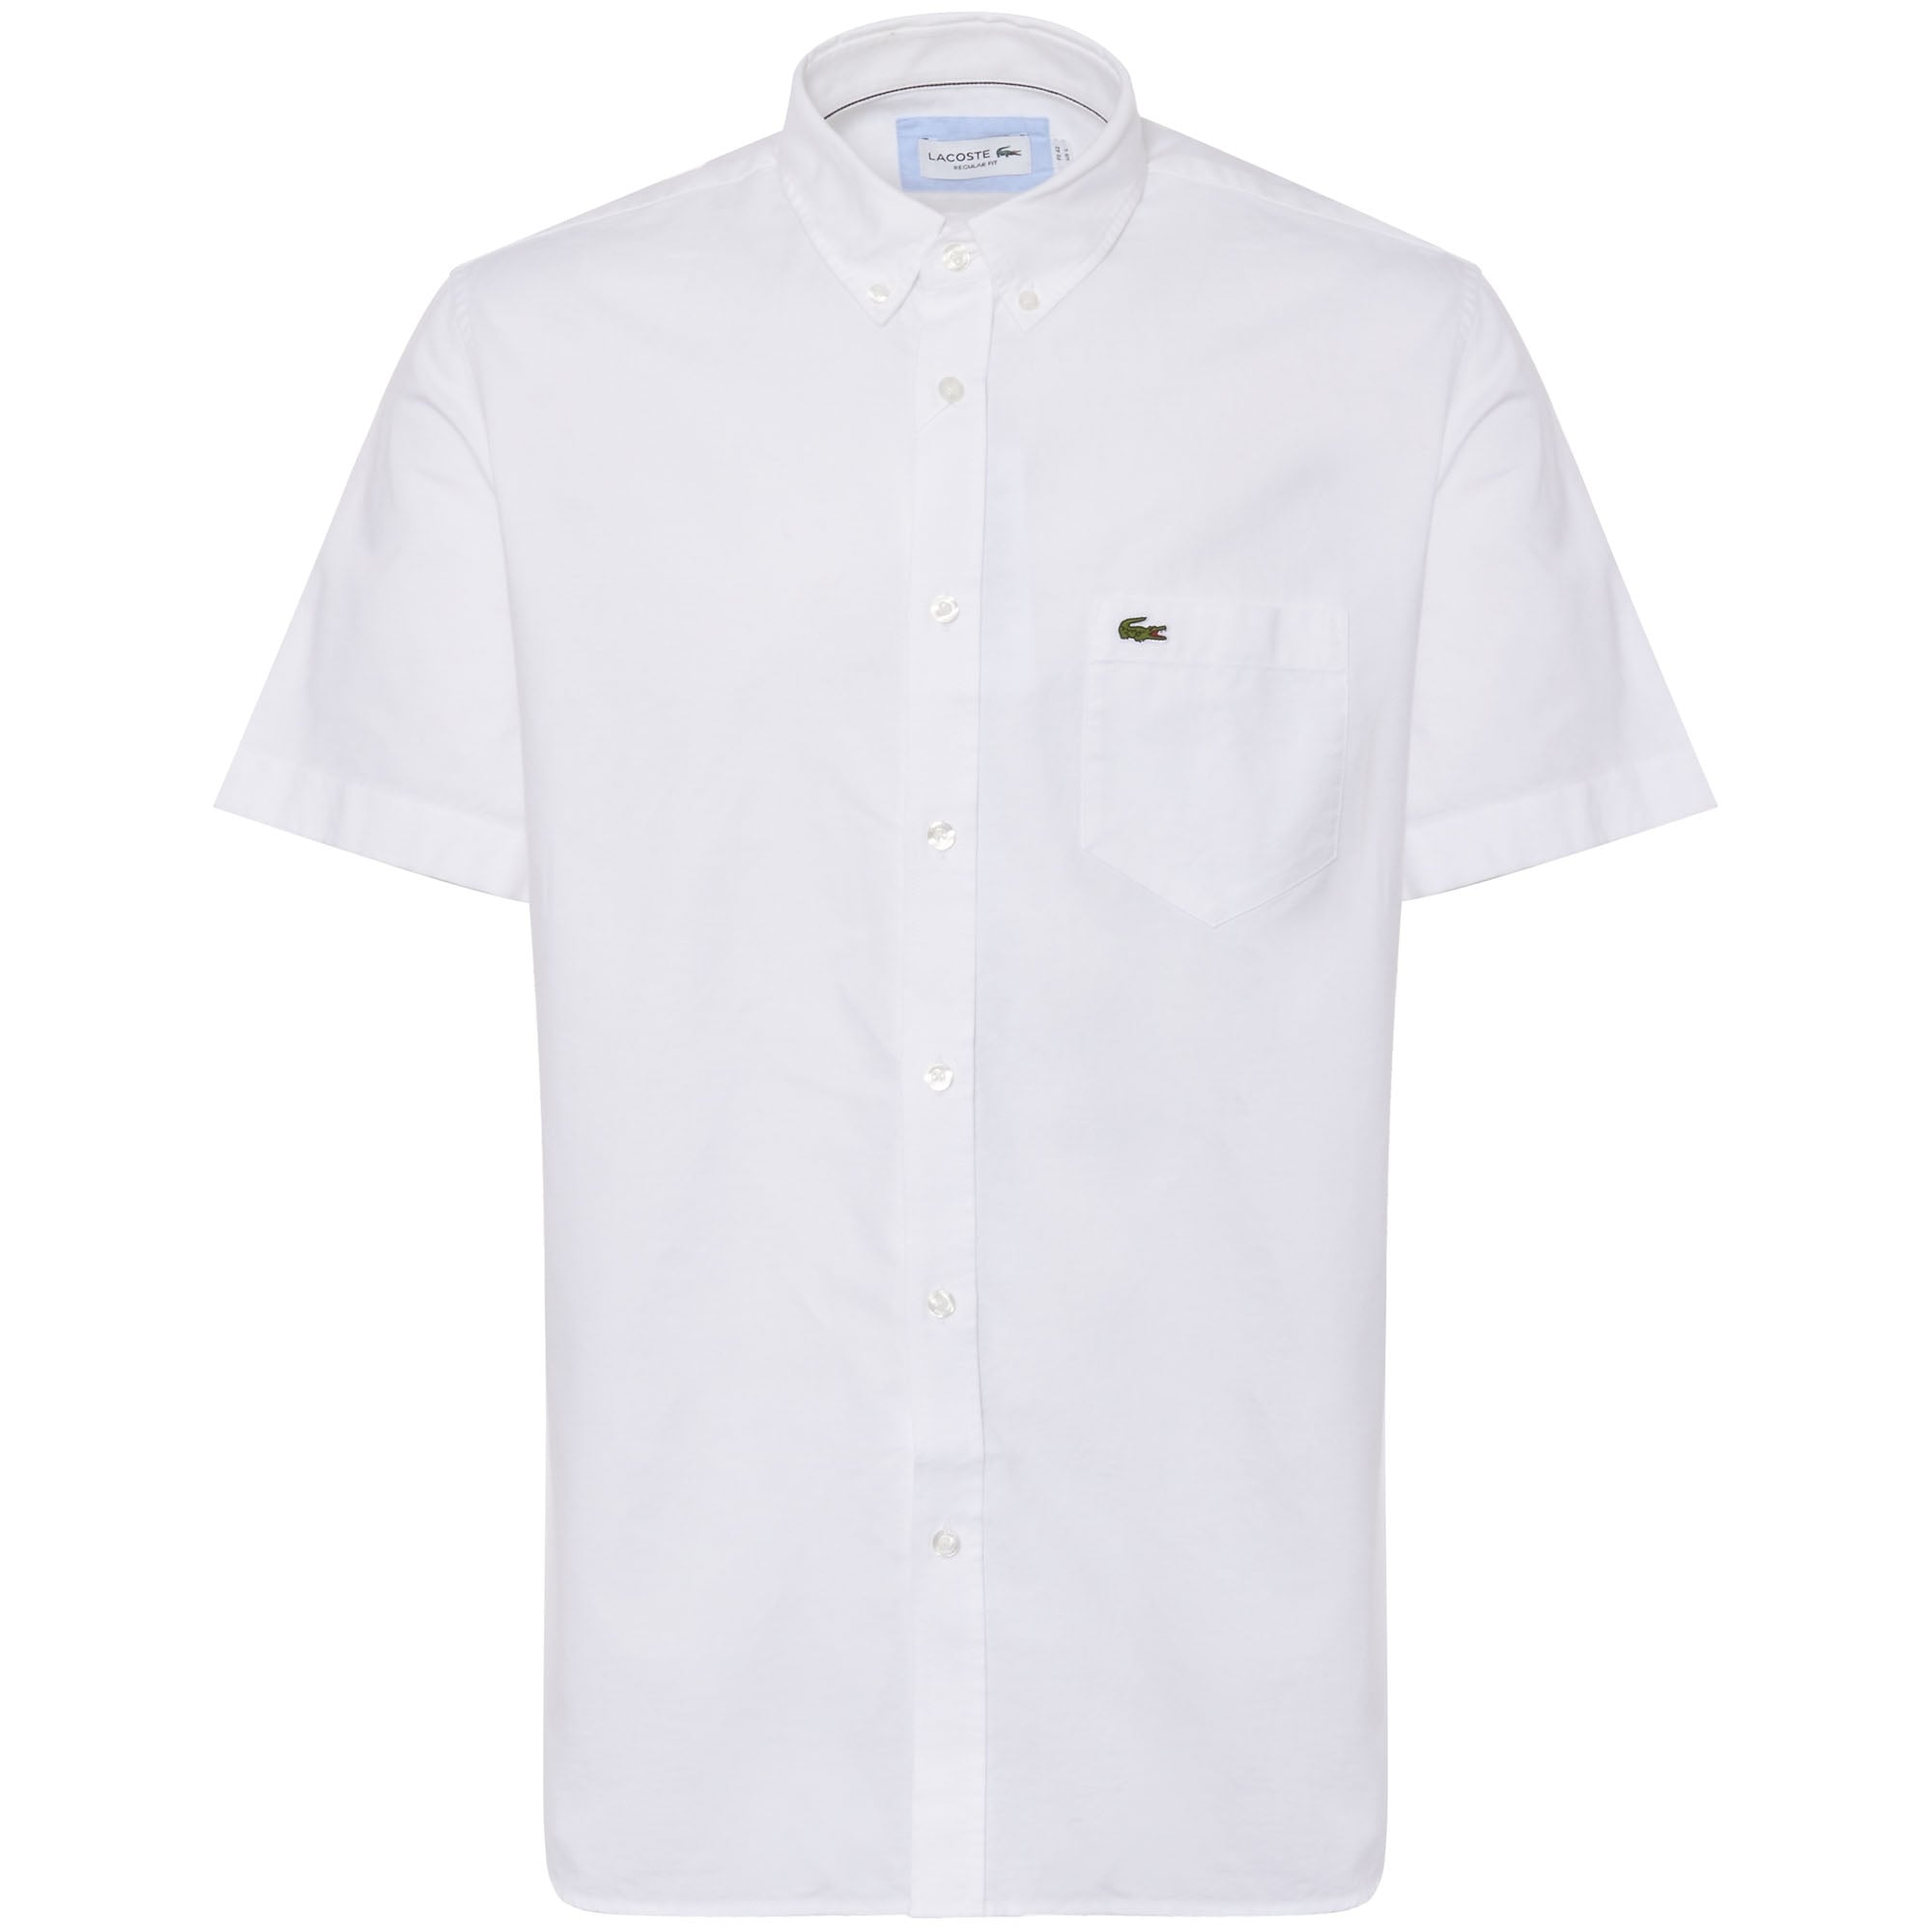 1eed4f05 White Short Sleeve Oxford Shirt